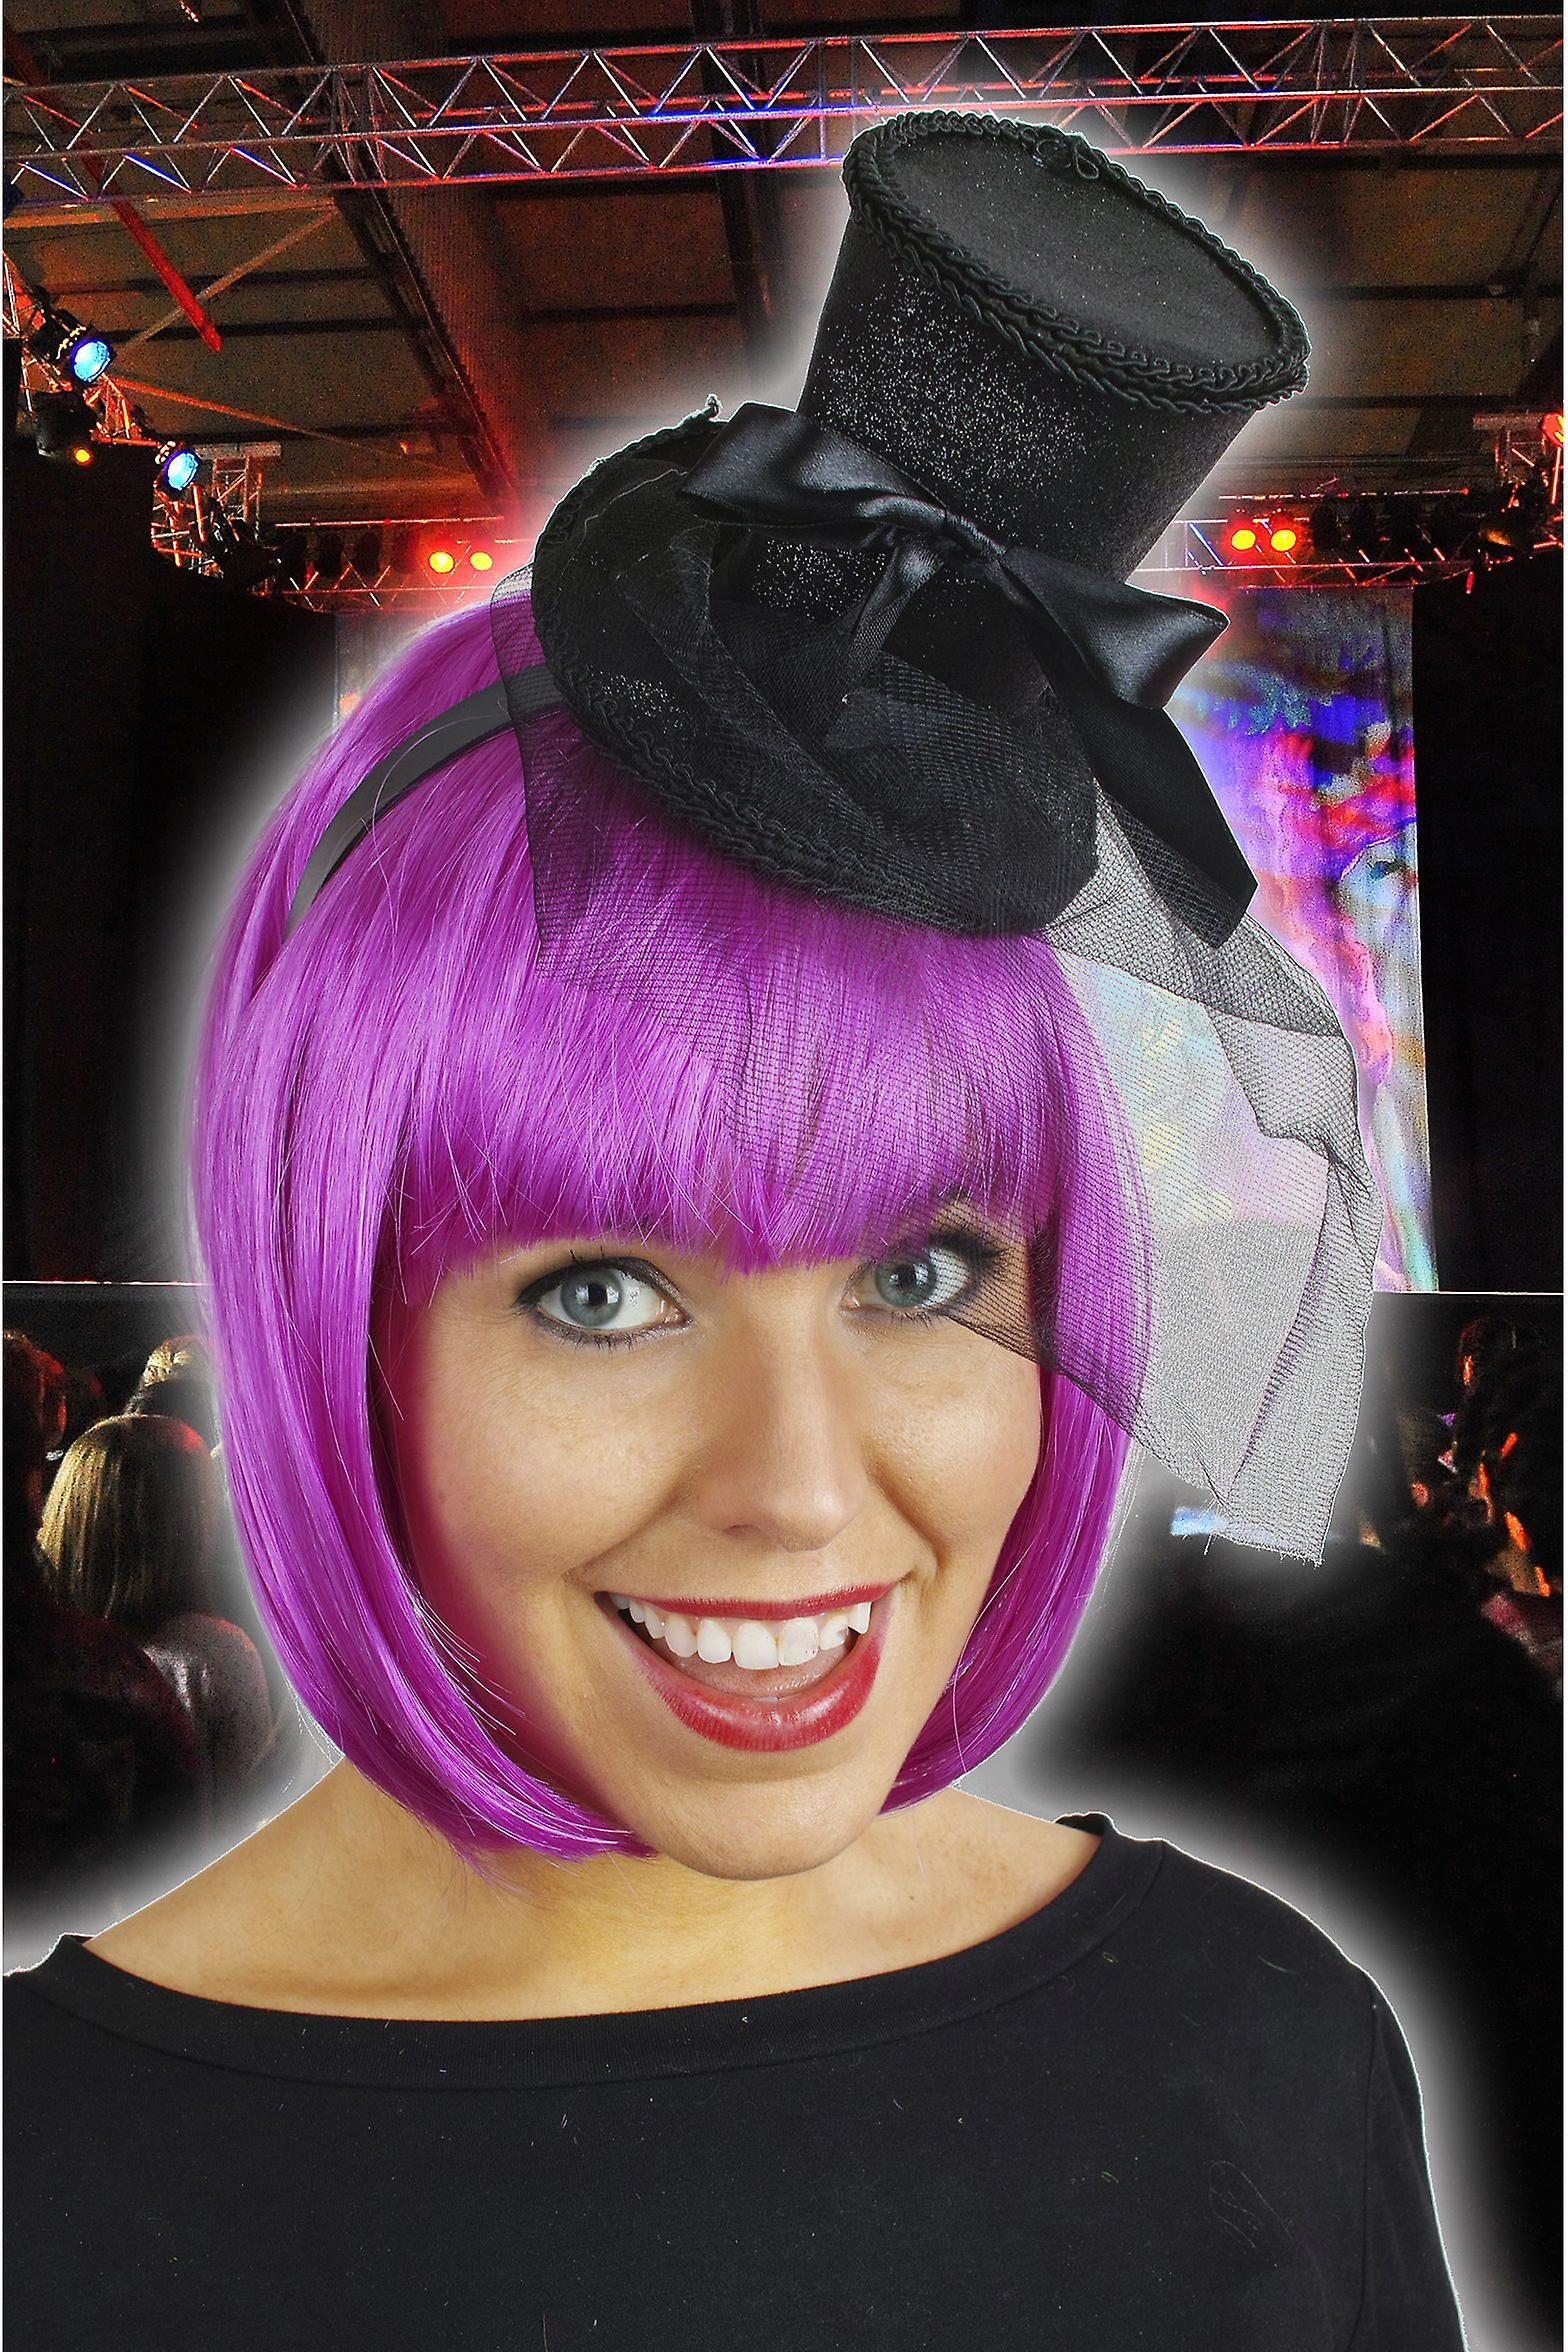 Hair Top Hat Glittering Glittering Hair Hair Glittering Top Accessories Hat Accessories Accessories PXuwOTkZil